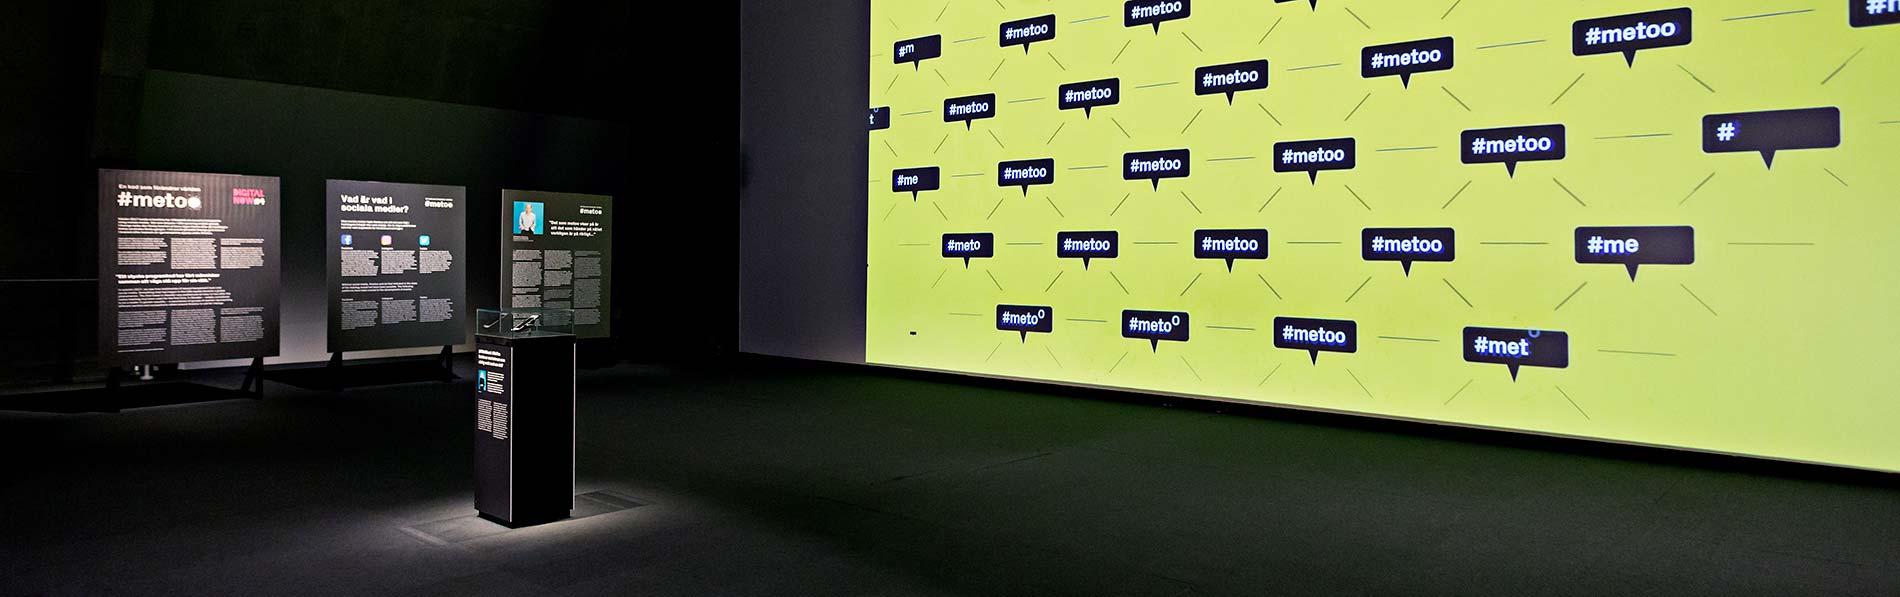 Film som beskriver uppropet #metoo på stor projektionsduk